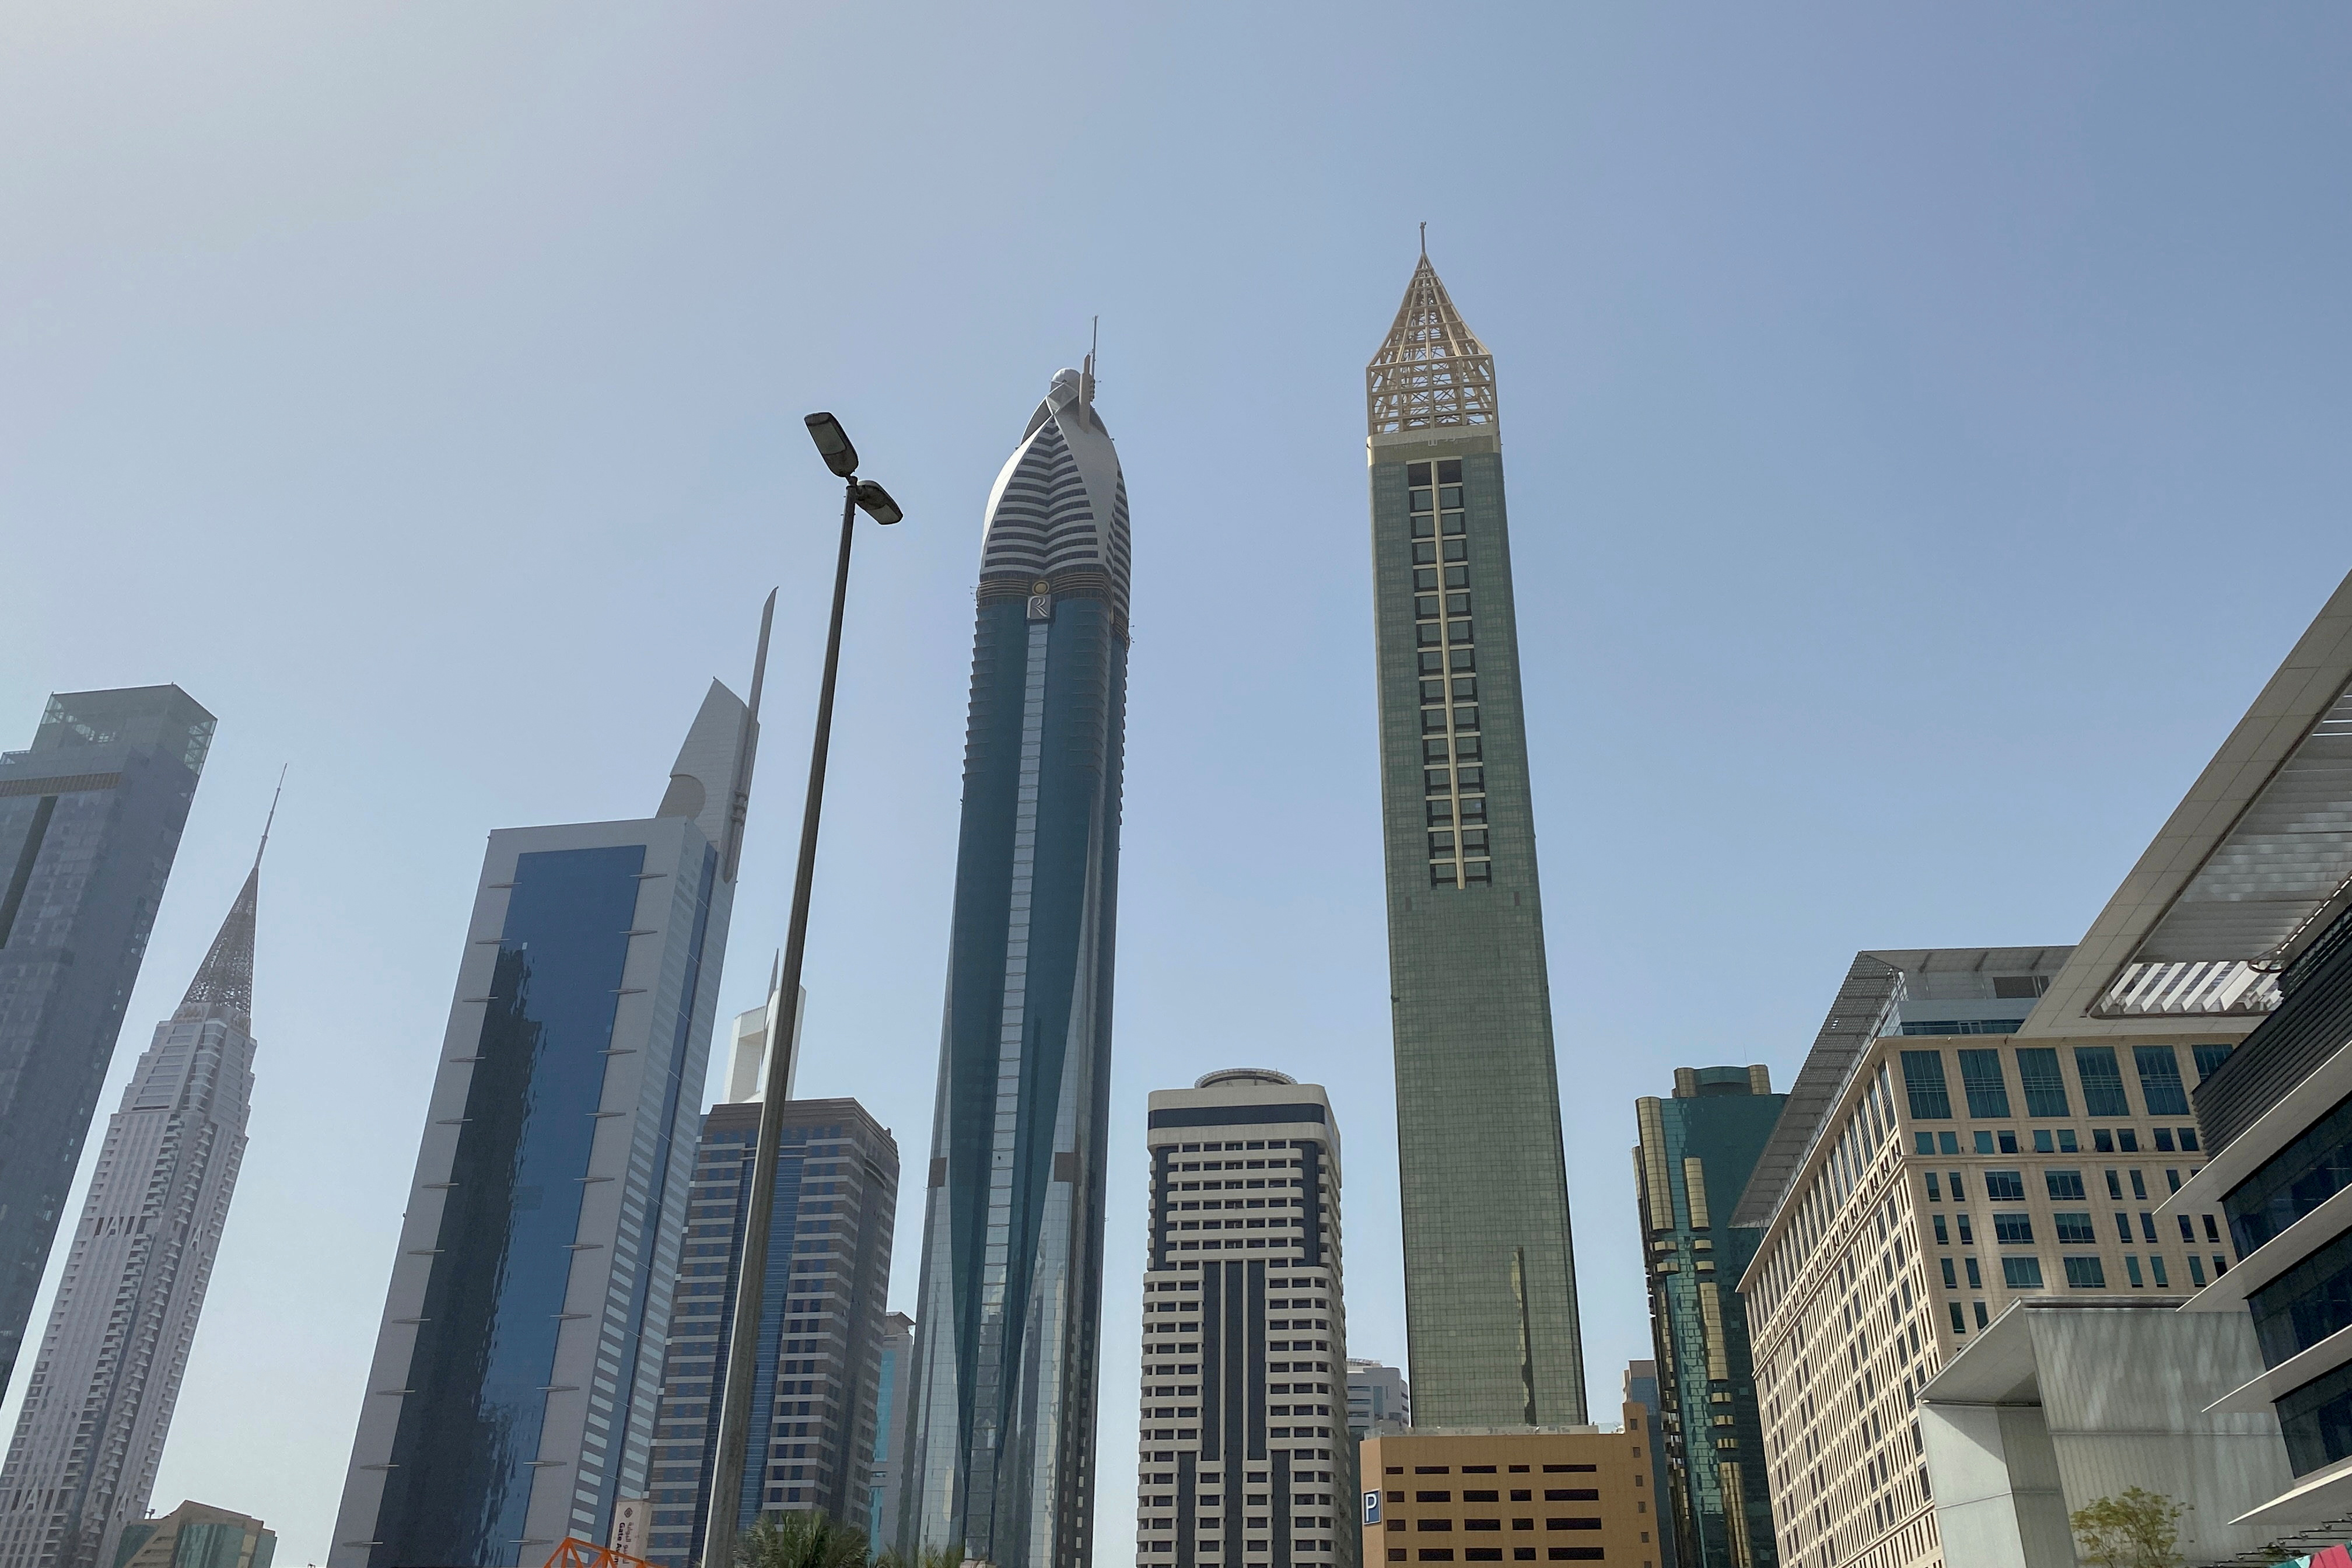 Gevora Hotel is pictured in Dubai, Untited Arab Emirates, March 25, 2021. Picture taken March 25, 2021. REUTERS/Abdel Hadi Ramahi